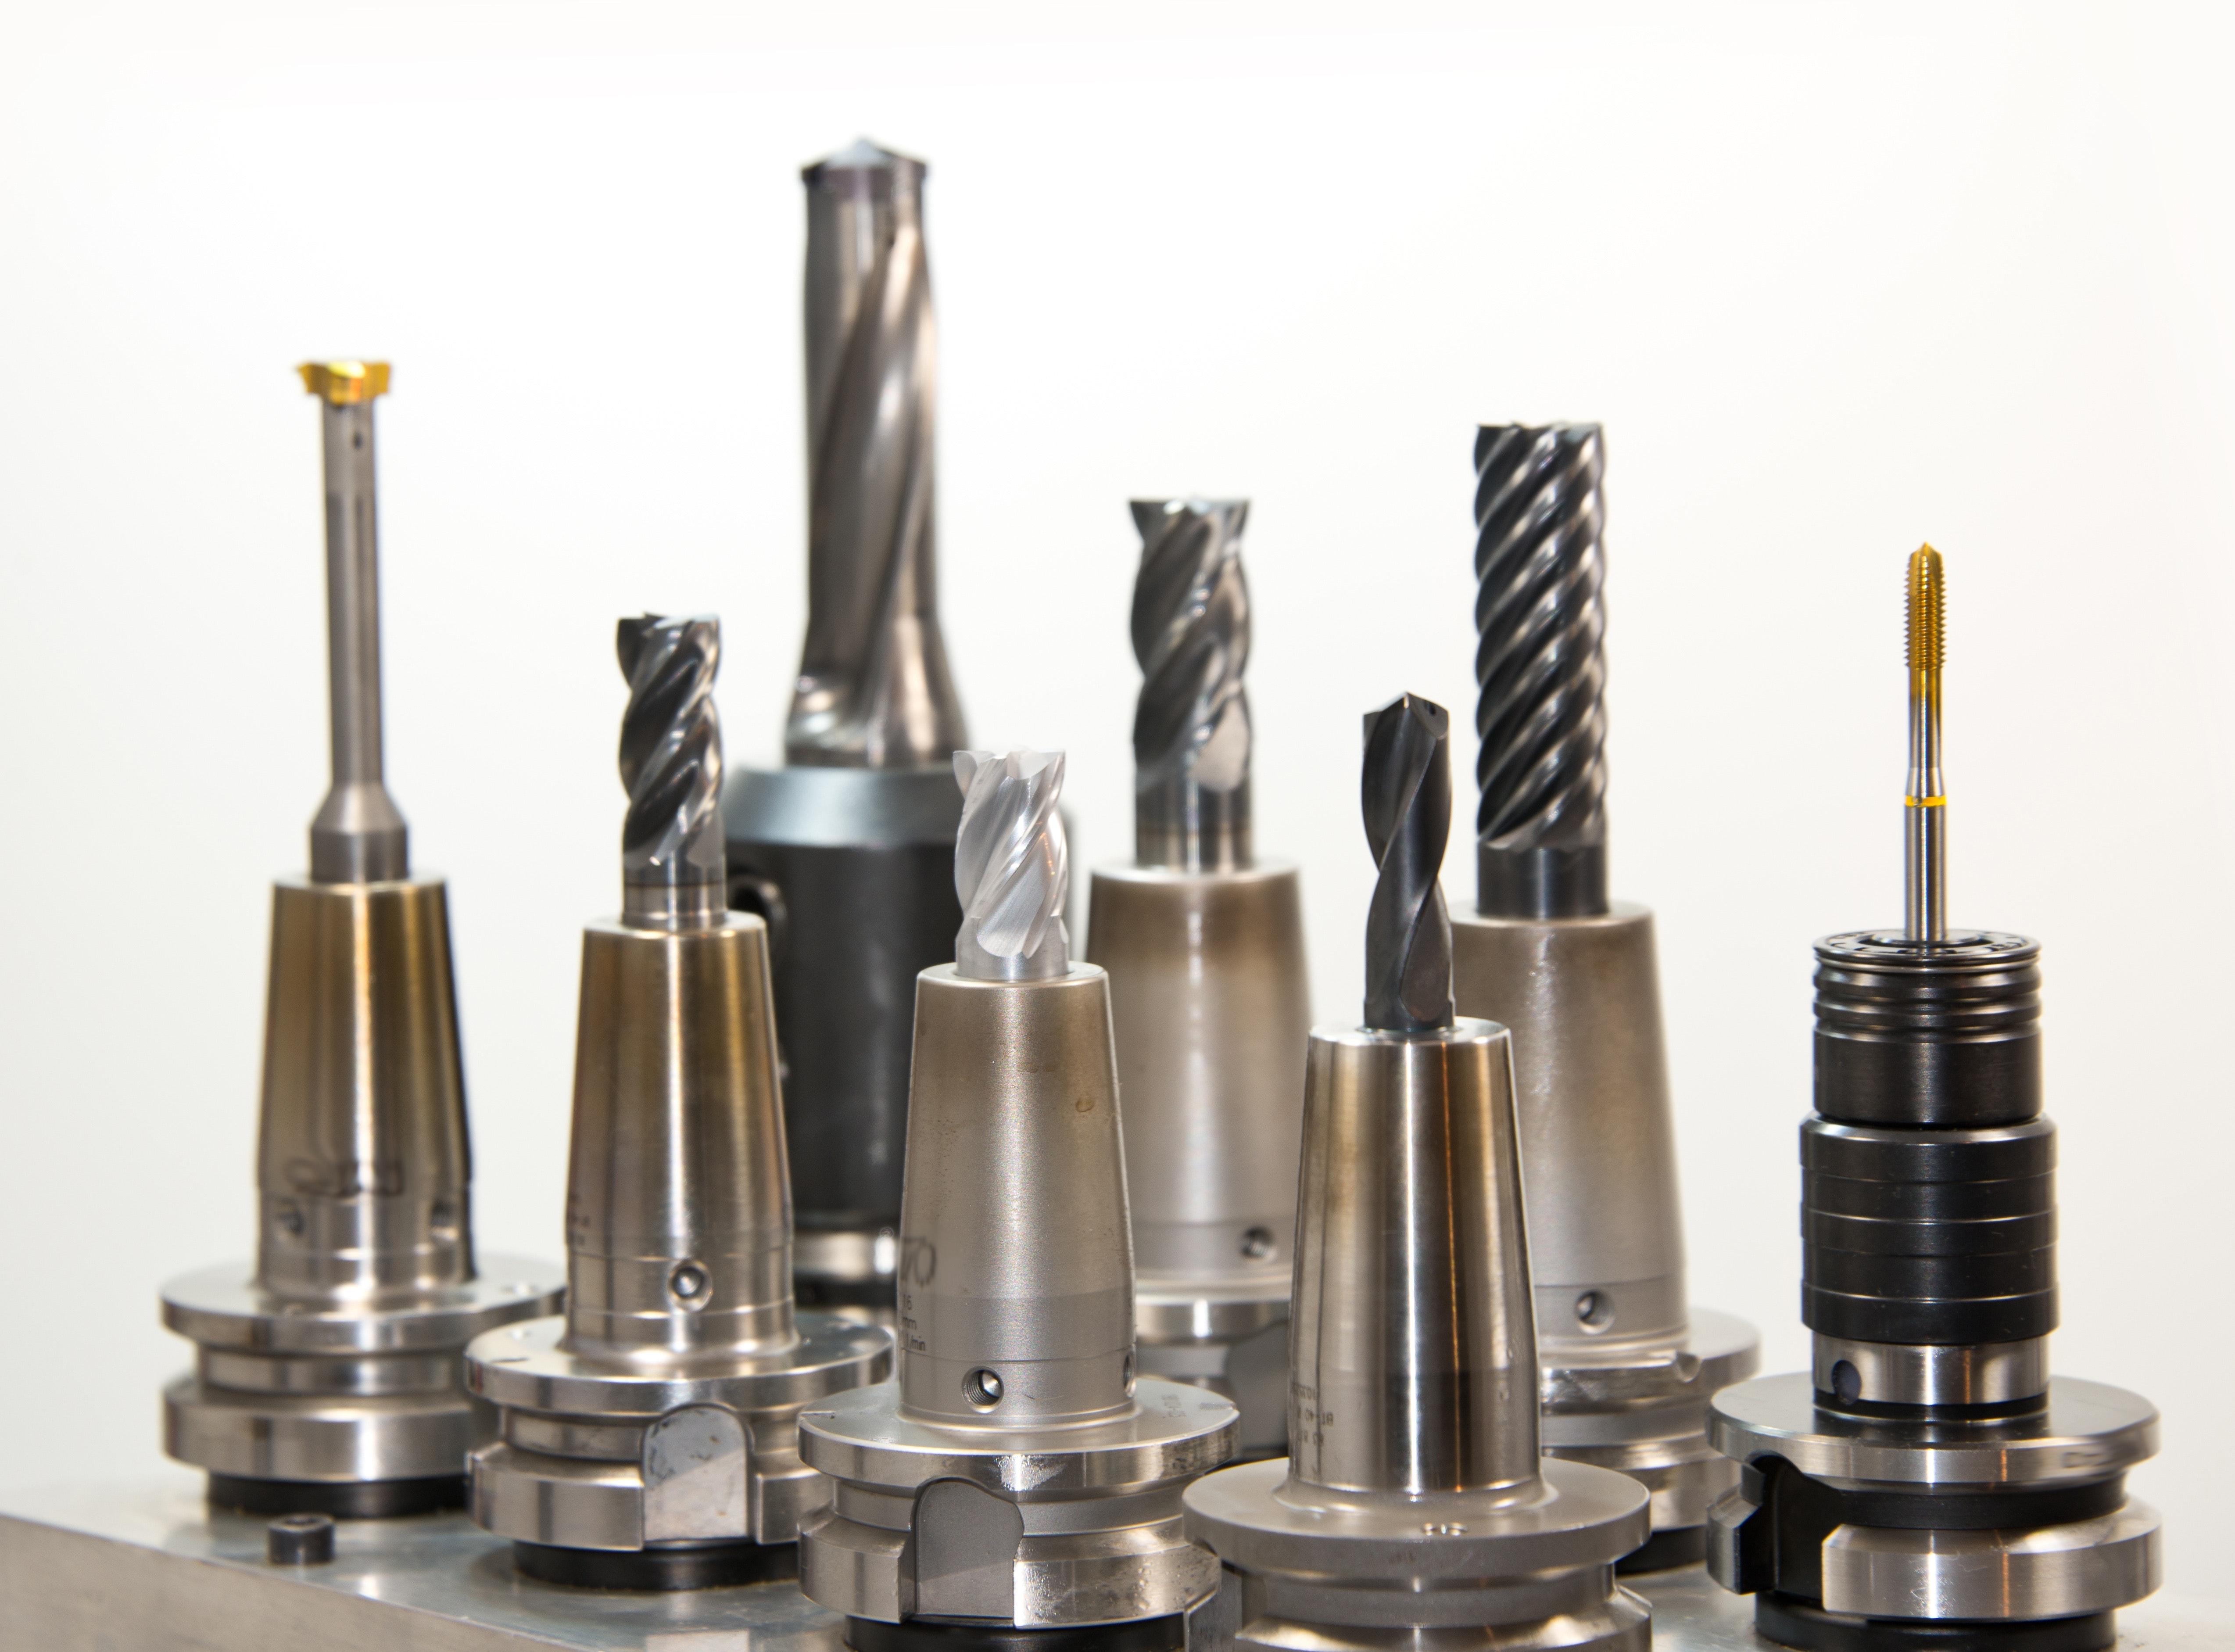 Silver Drill Bits Set, Tools, HQ Photo